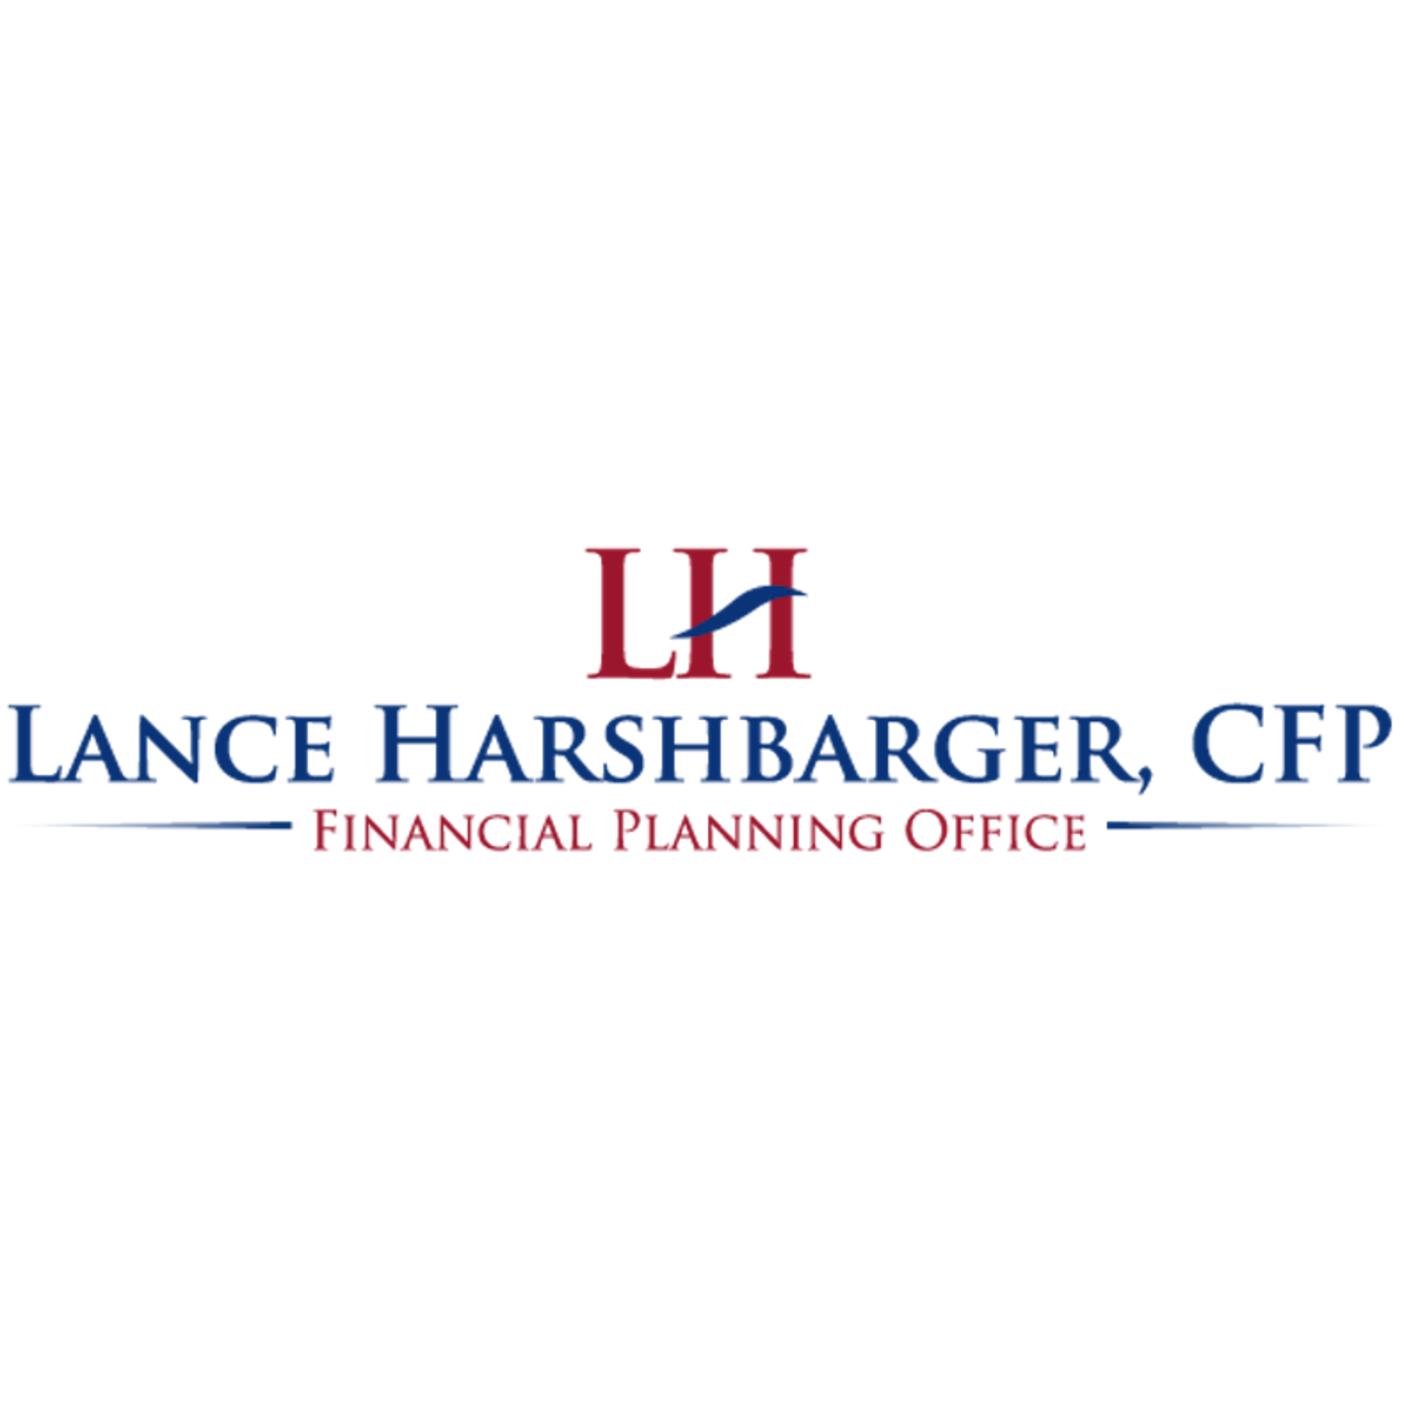 Lance Harshbarger, CFP - Securities America, Inc.